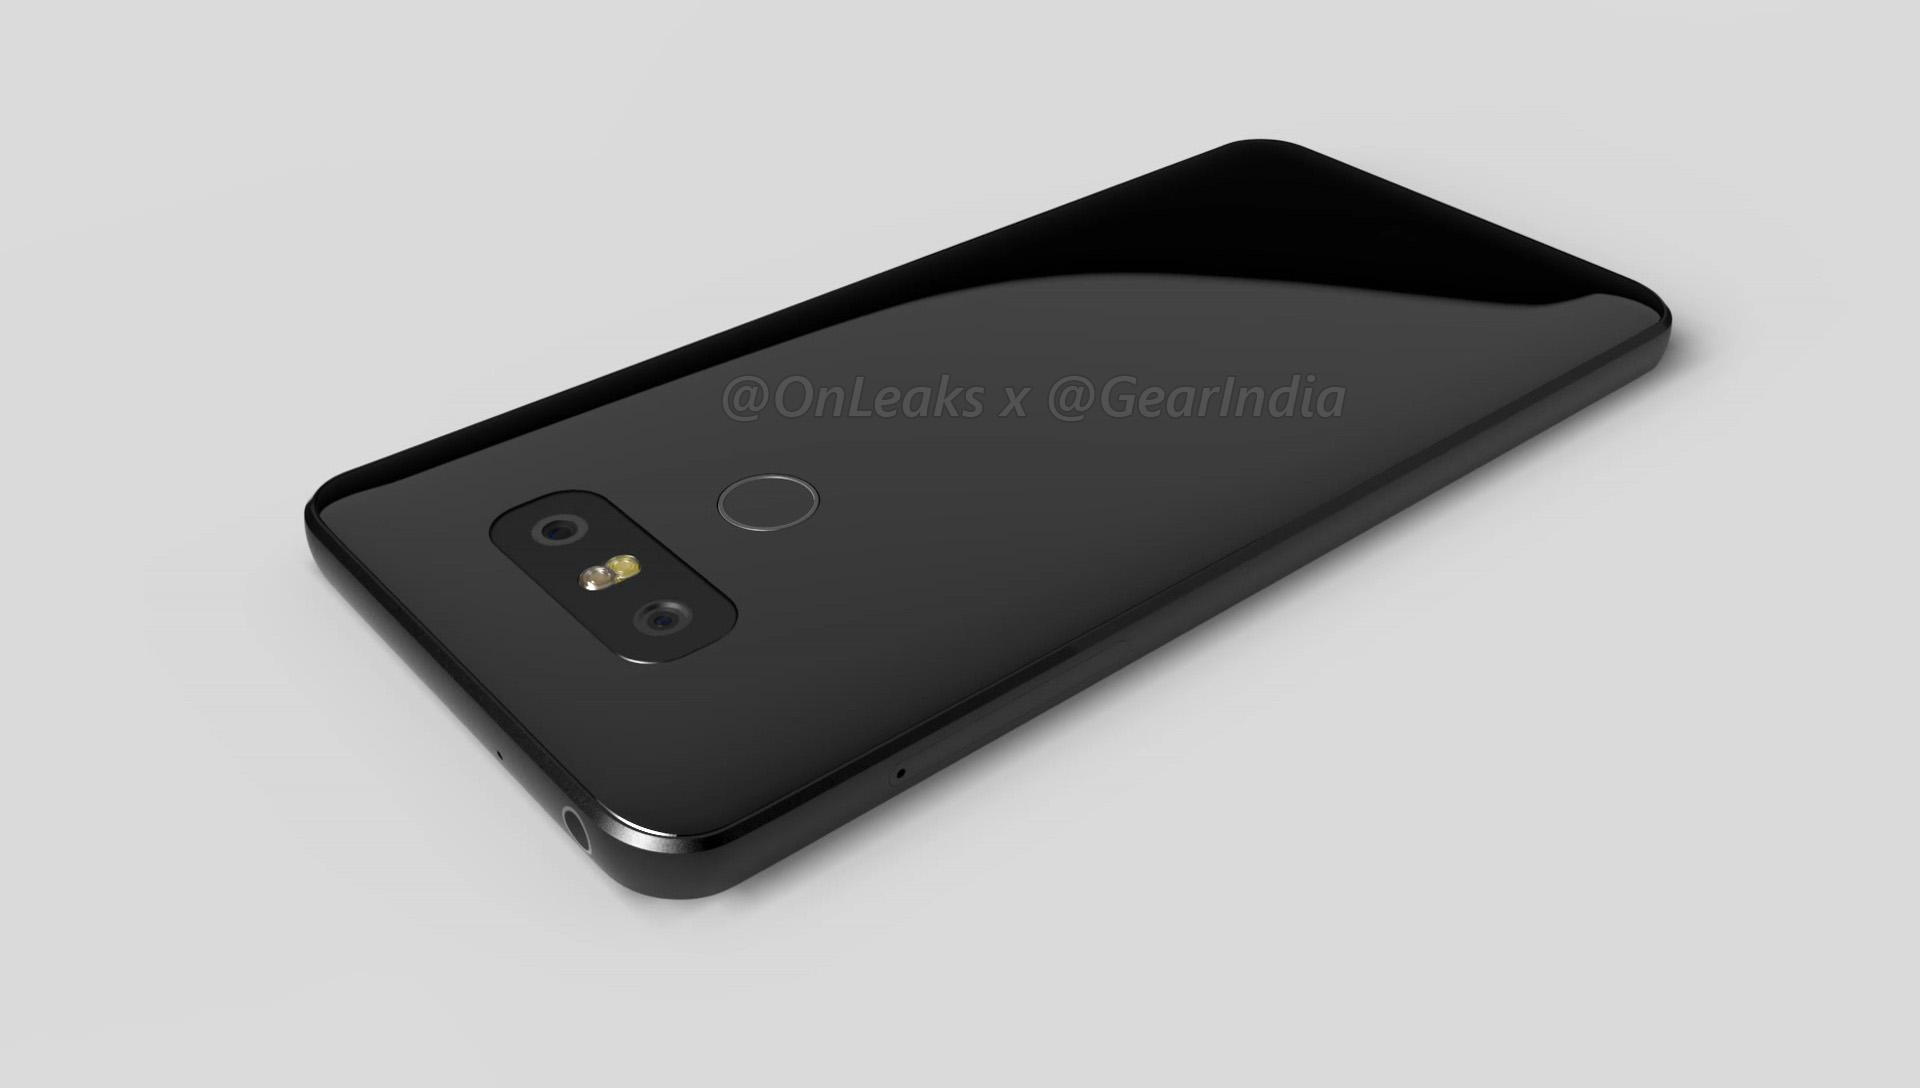 Así luce el nuevo LG G6